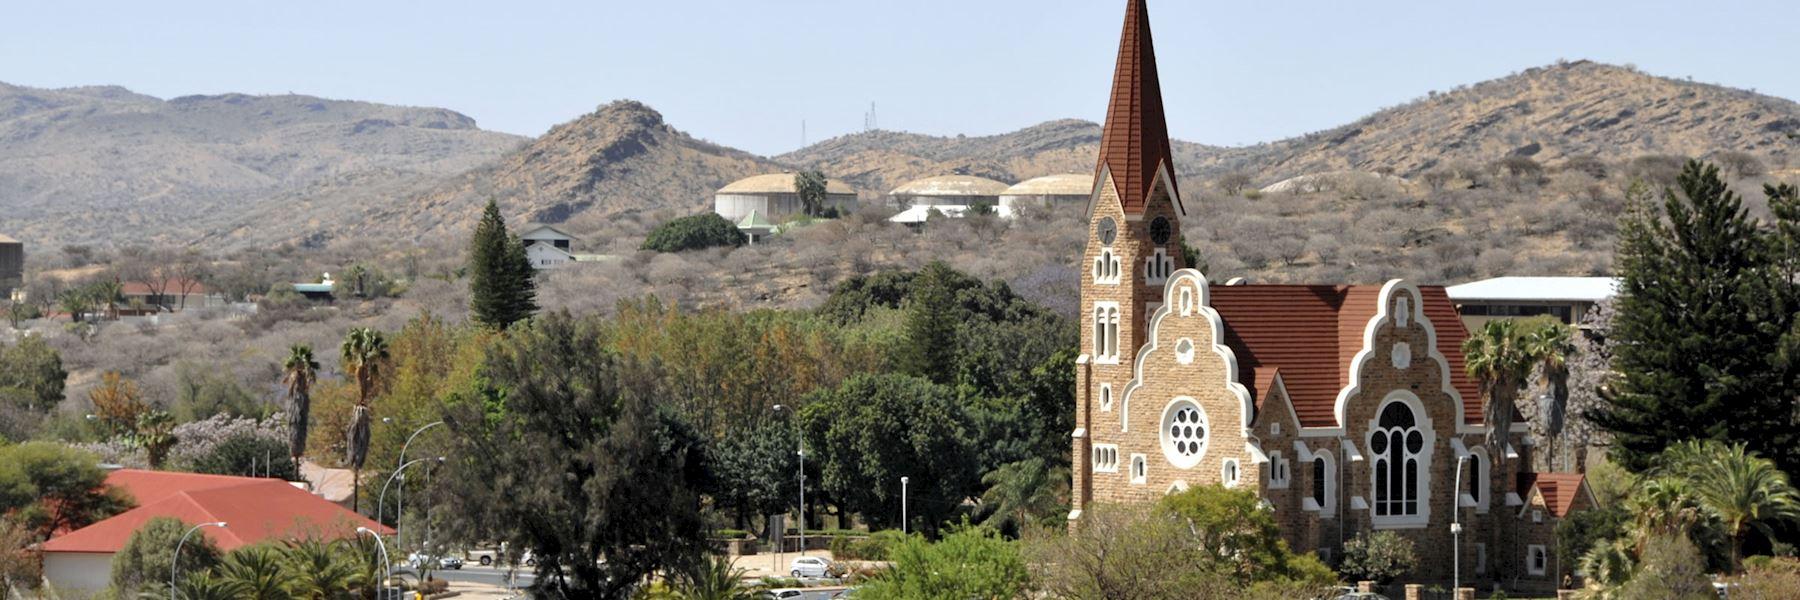 Visit Windhoek, Namibia